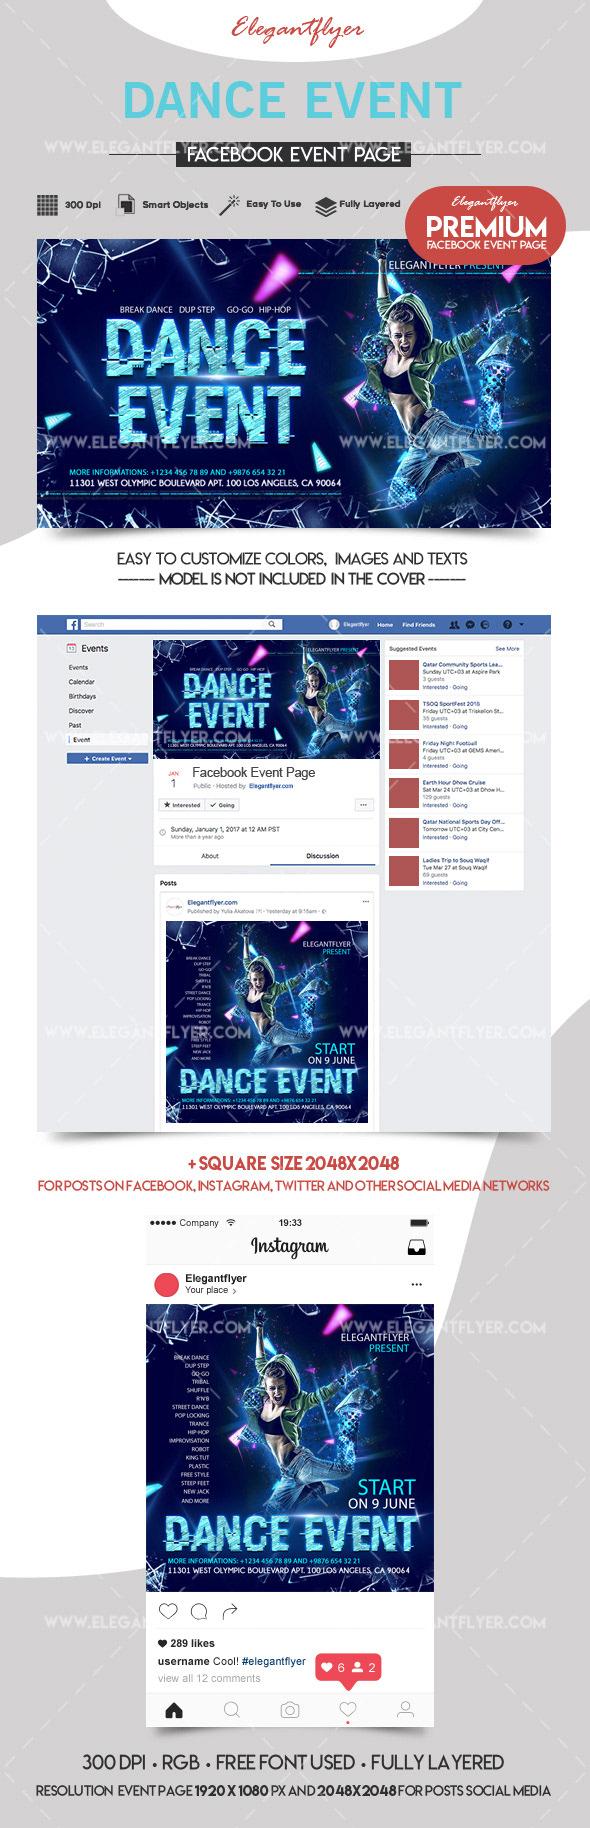 Dance Event – Facebook Event + Instagram template on Behance